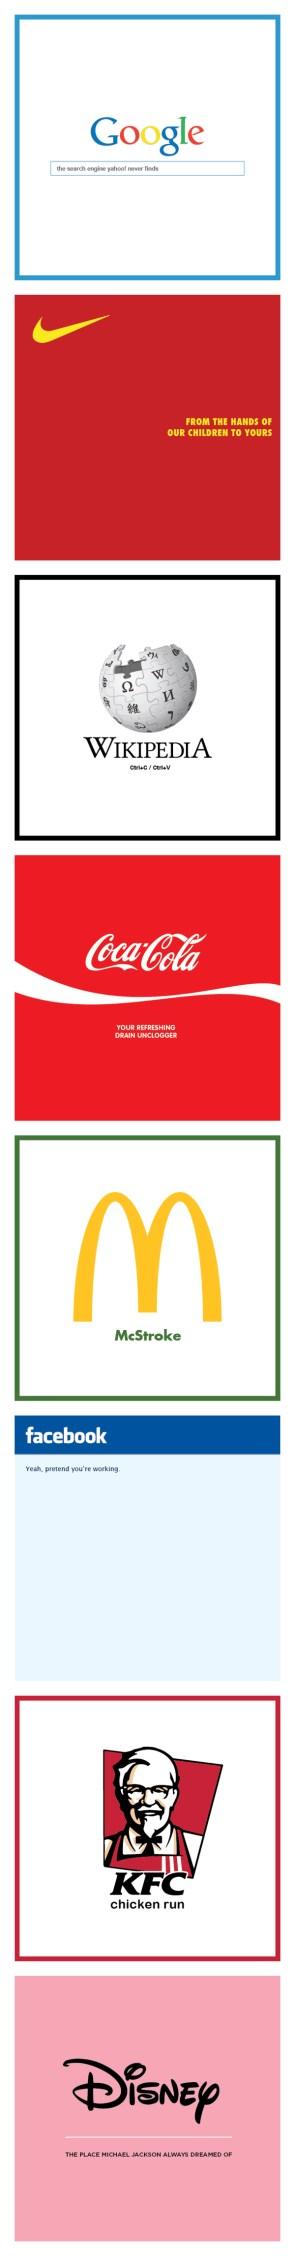 realistic slogans